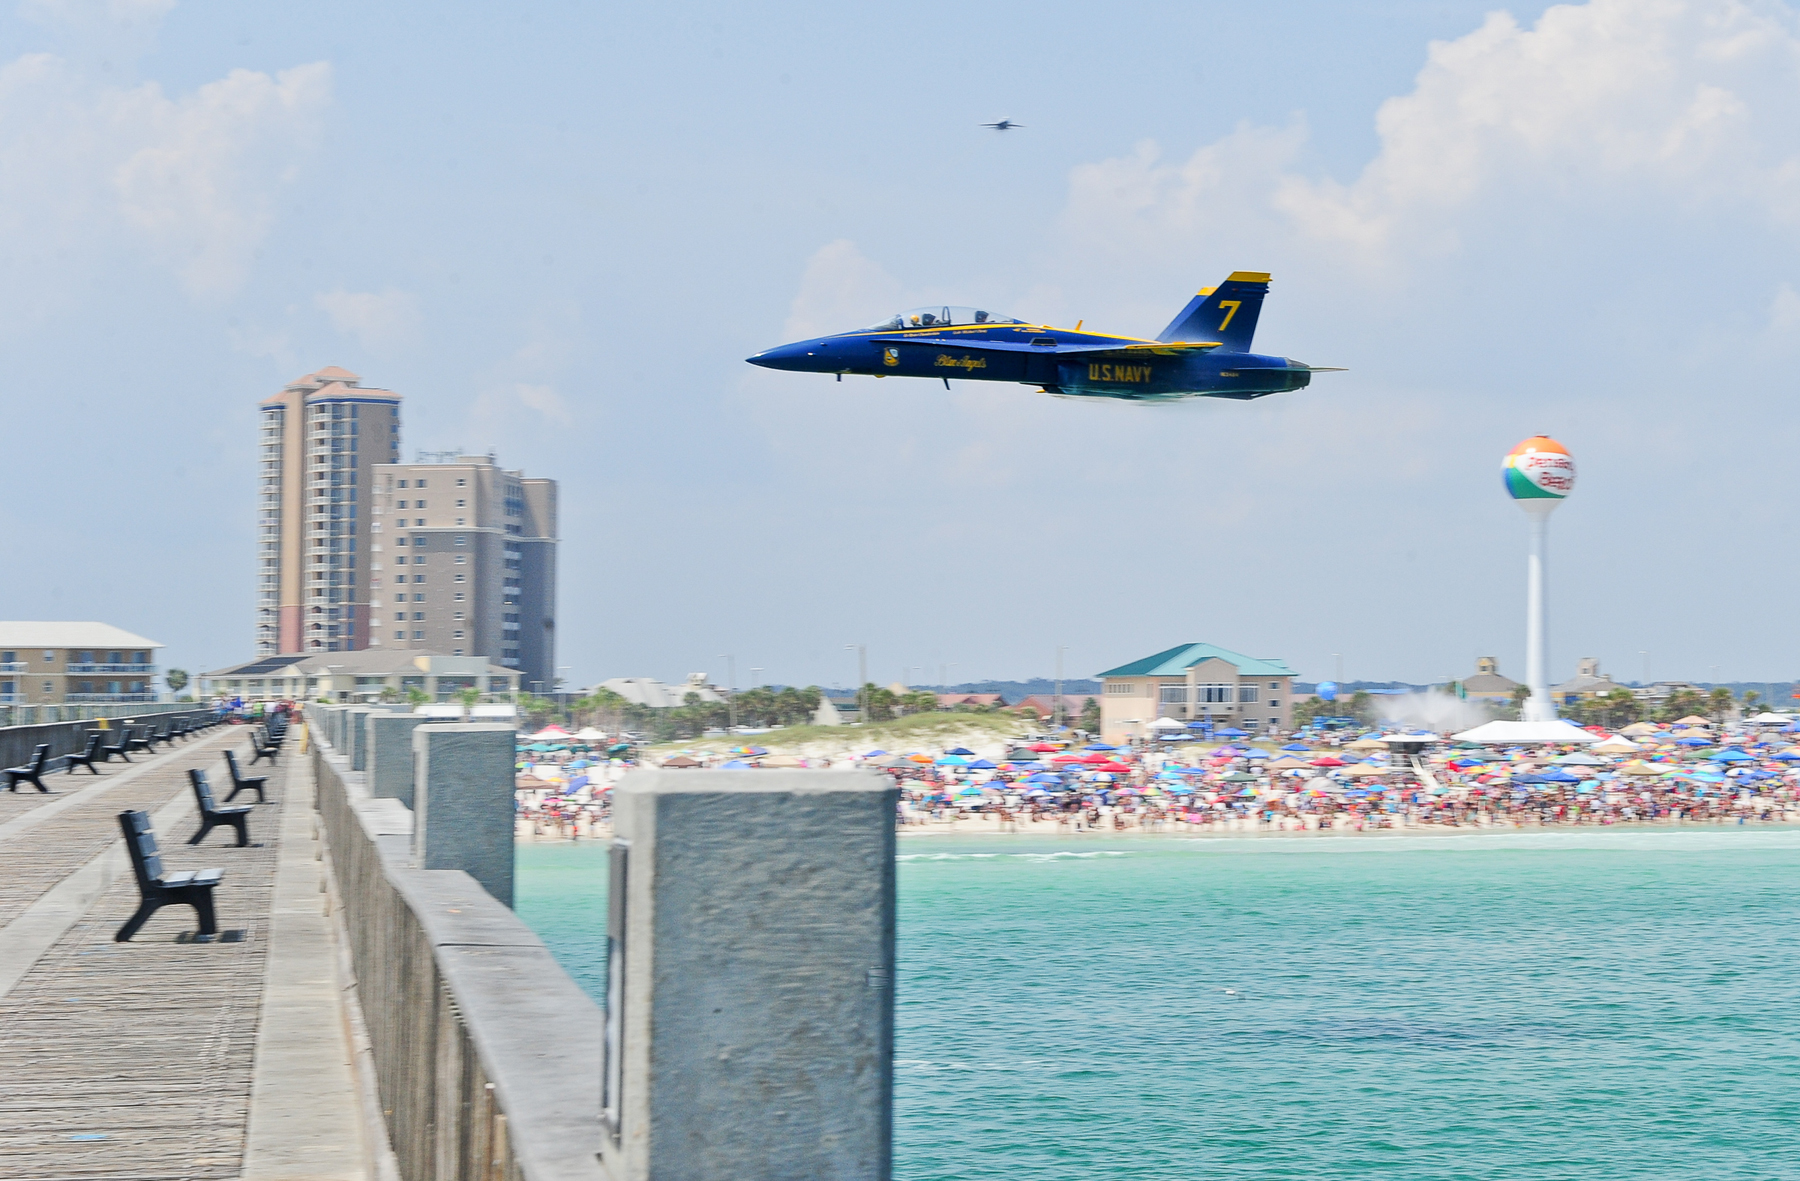 Patriotic Spirit and Blue Angels soar at Annual Pensacola Beach Air Show